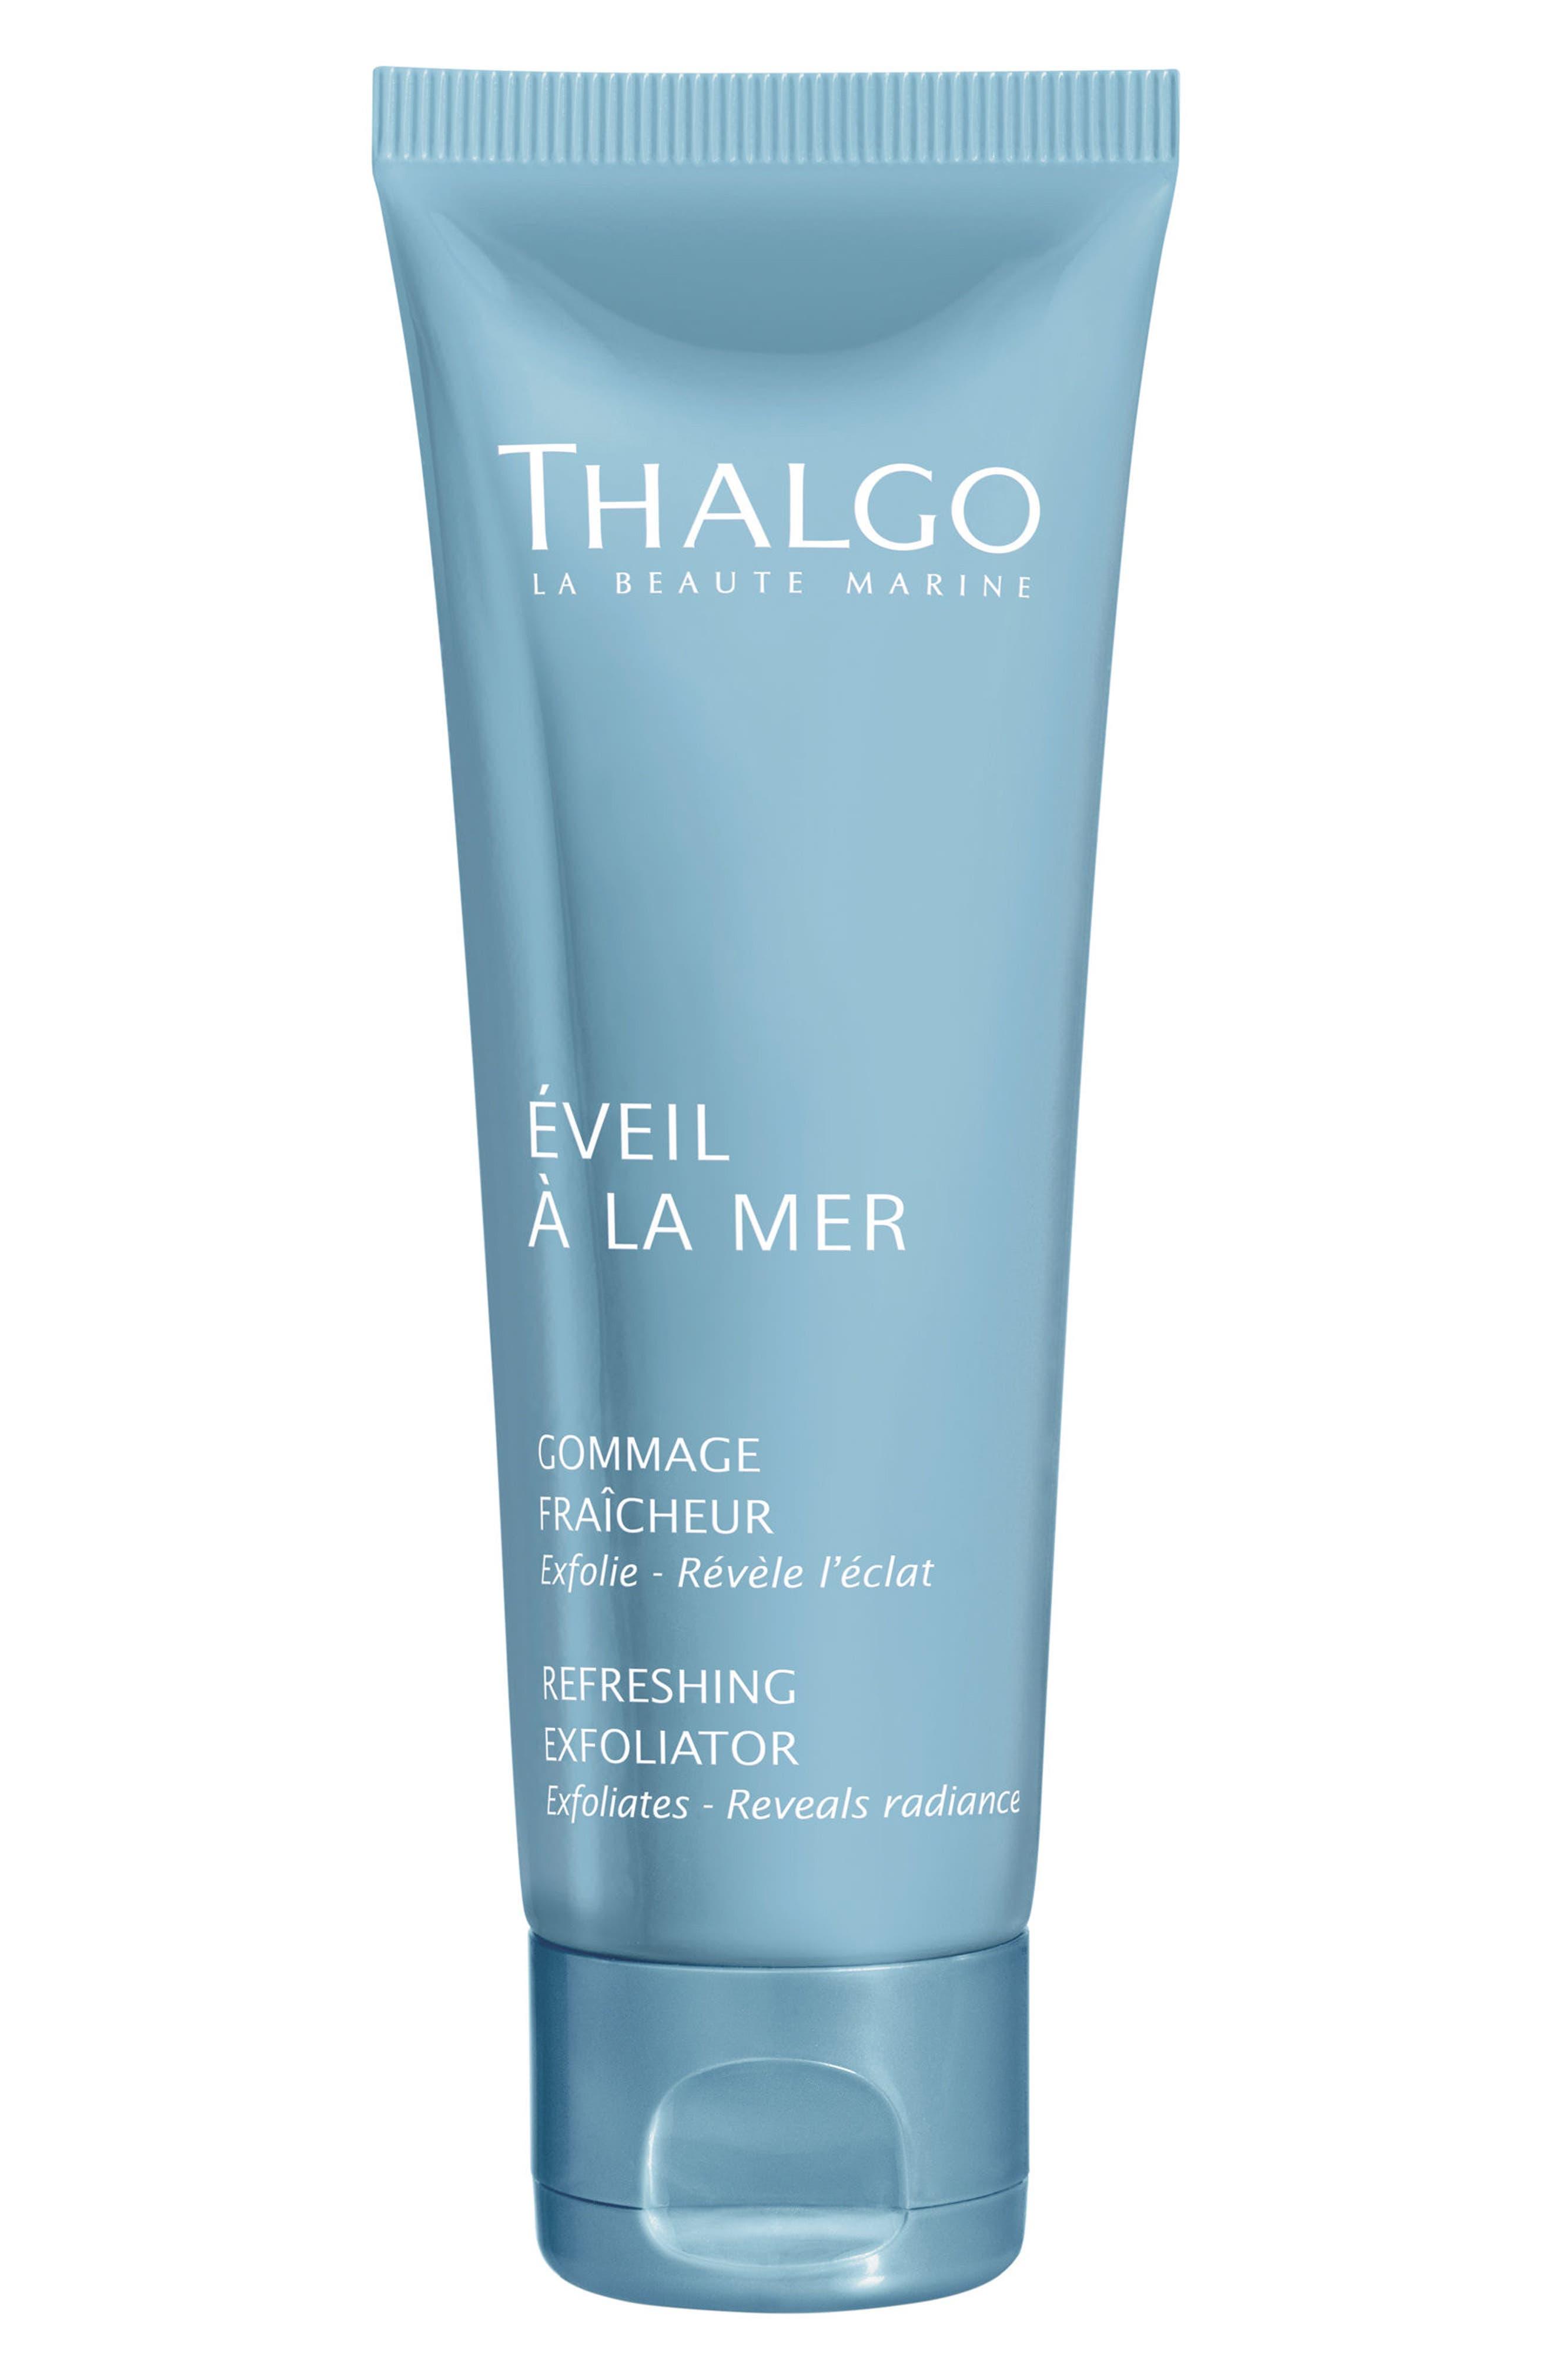 Thalgo Refreshing Exfoliator